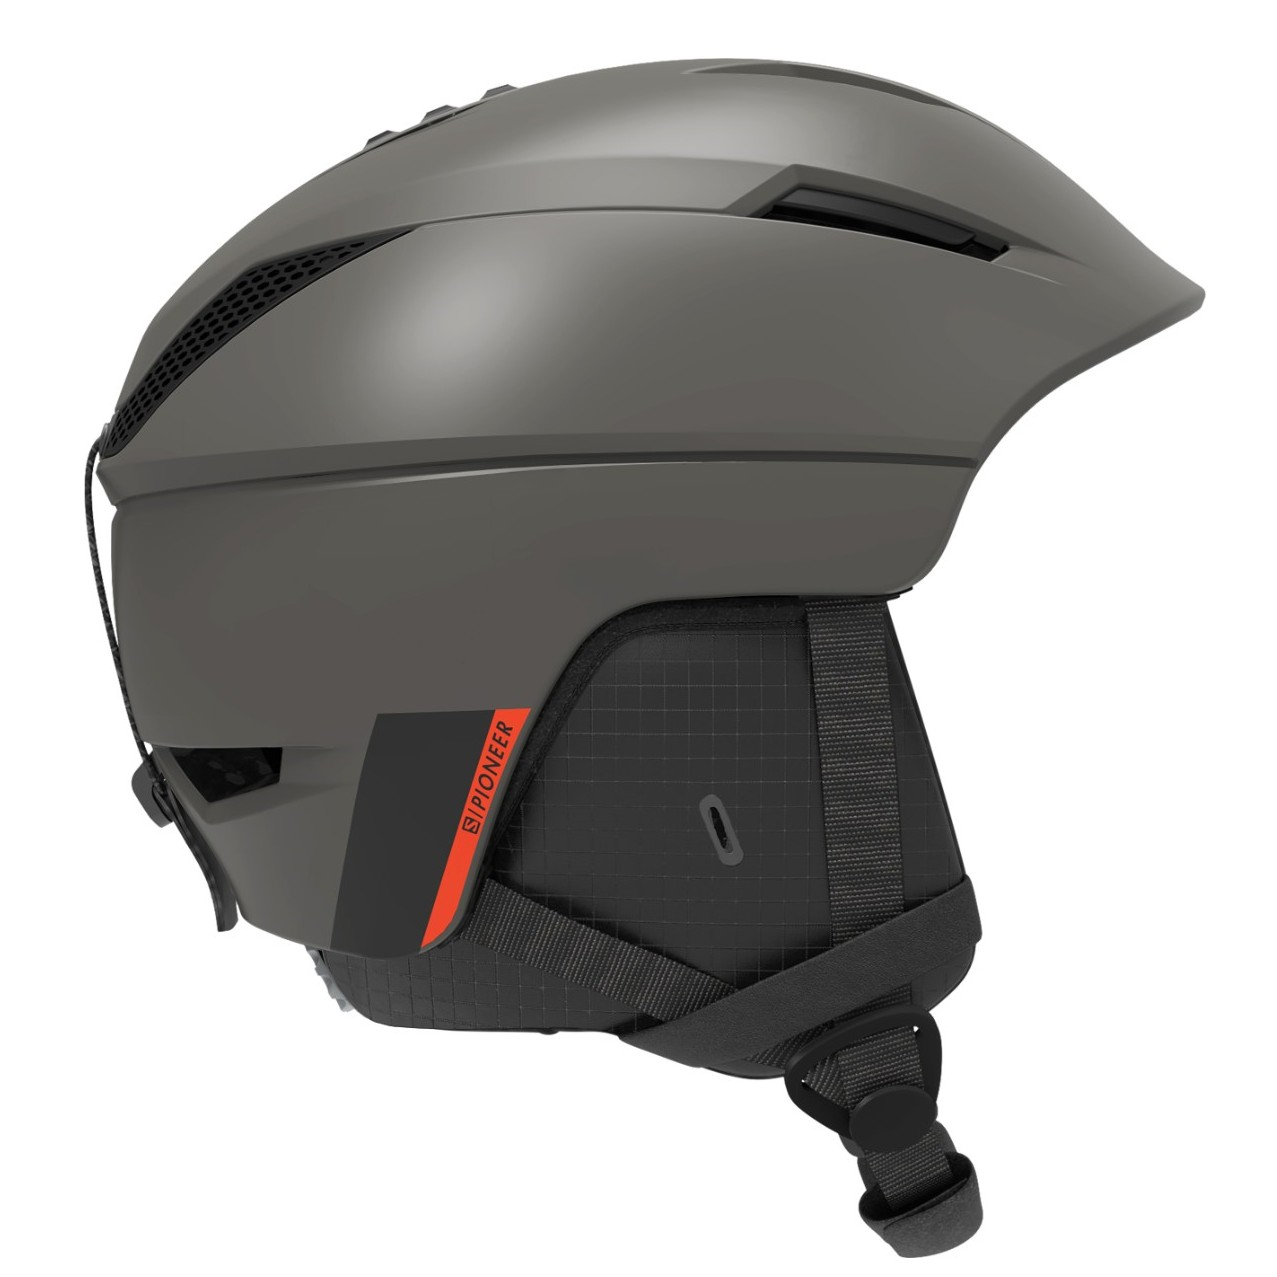 Salomon Pioneer Ski Helmet